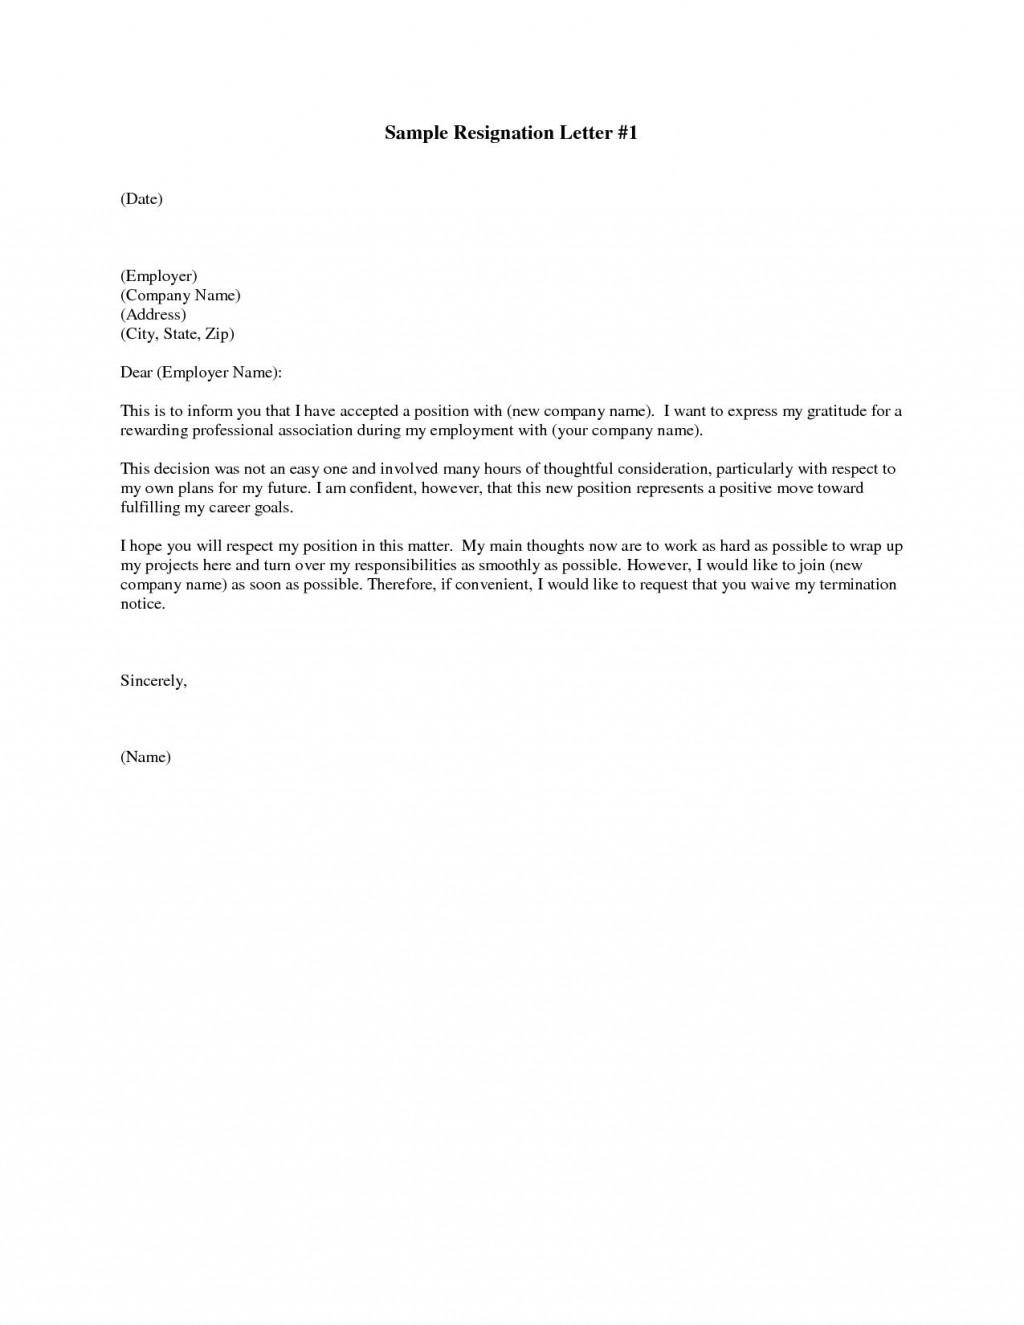 001 Marvelou Sample Resignation Letter Template Example  For Teacher Word - Free DownloadableLarge